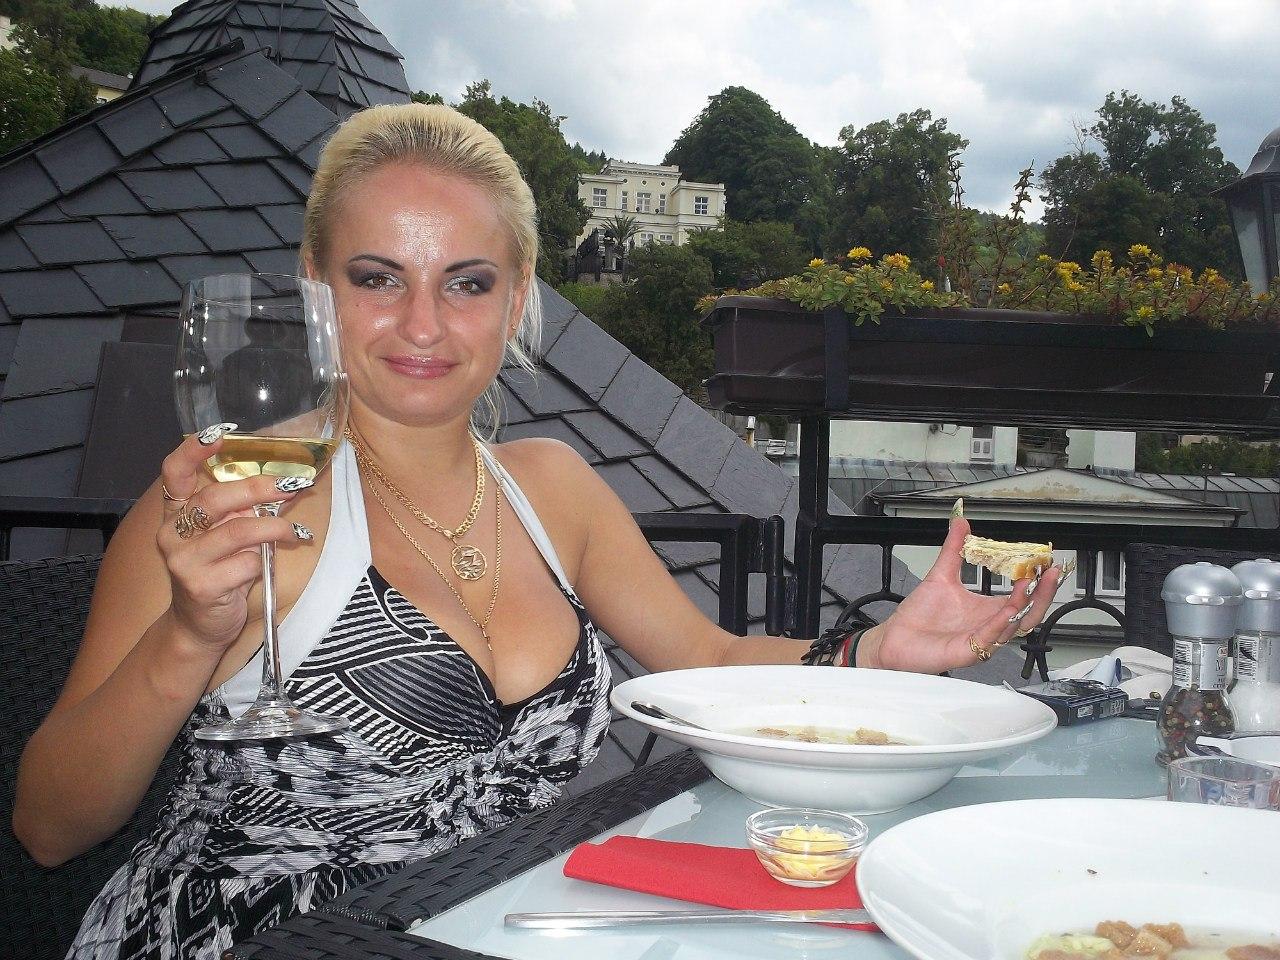 Елена Руденко ( Valteya ) . Чехия. Карловы Вары. Лето 2012. BVvZpGs20vQ